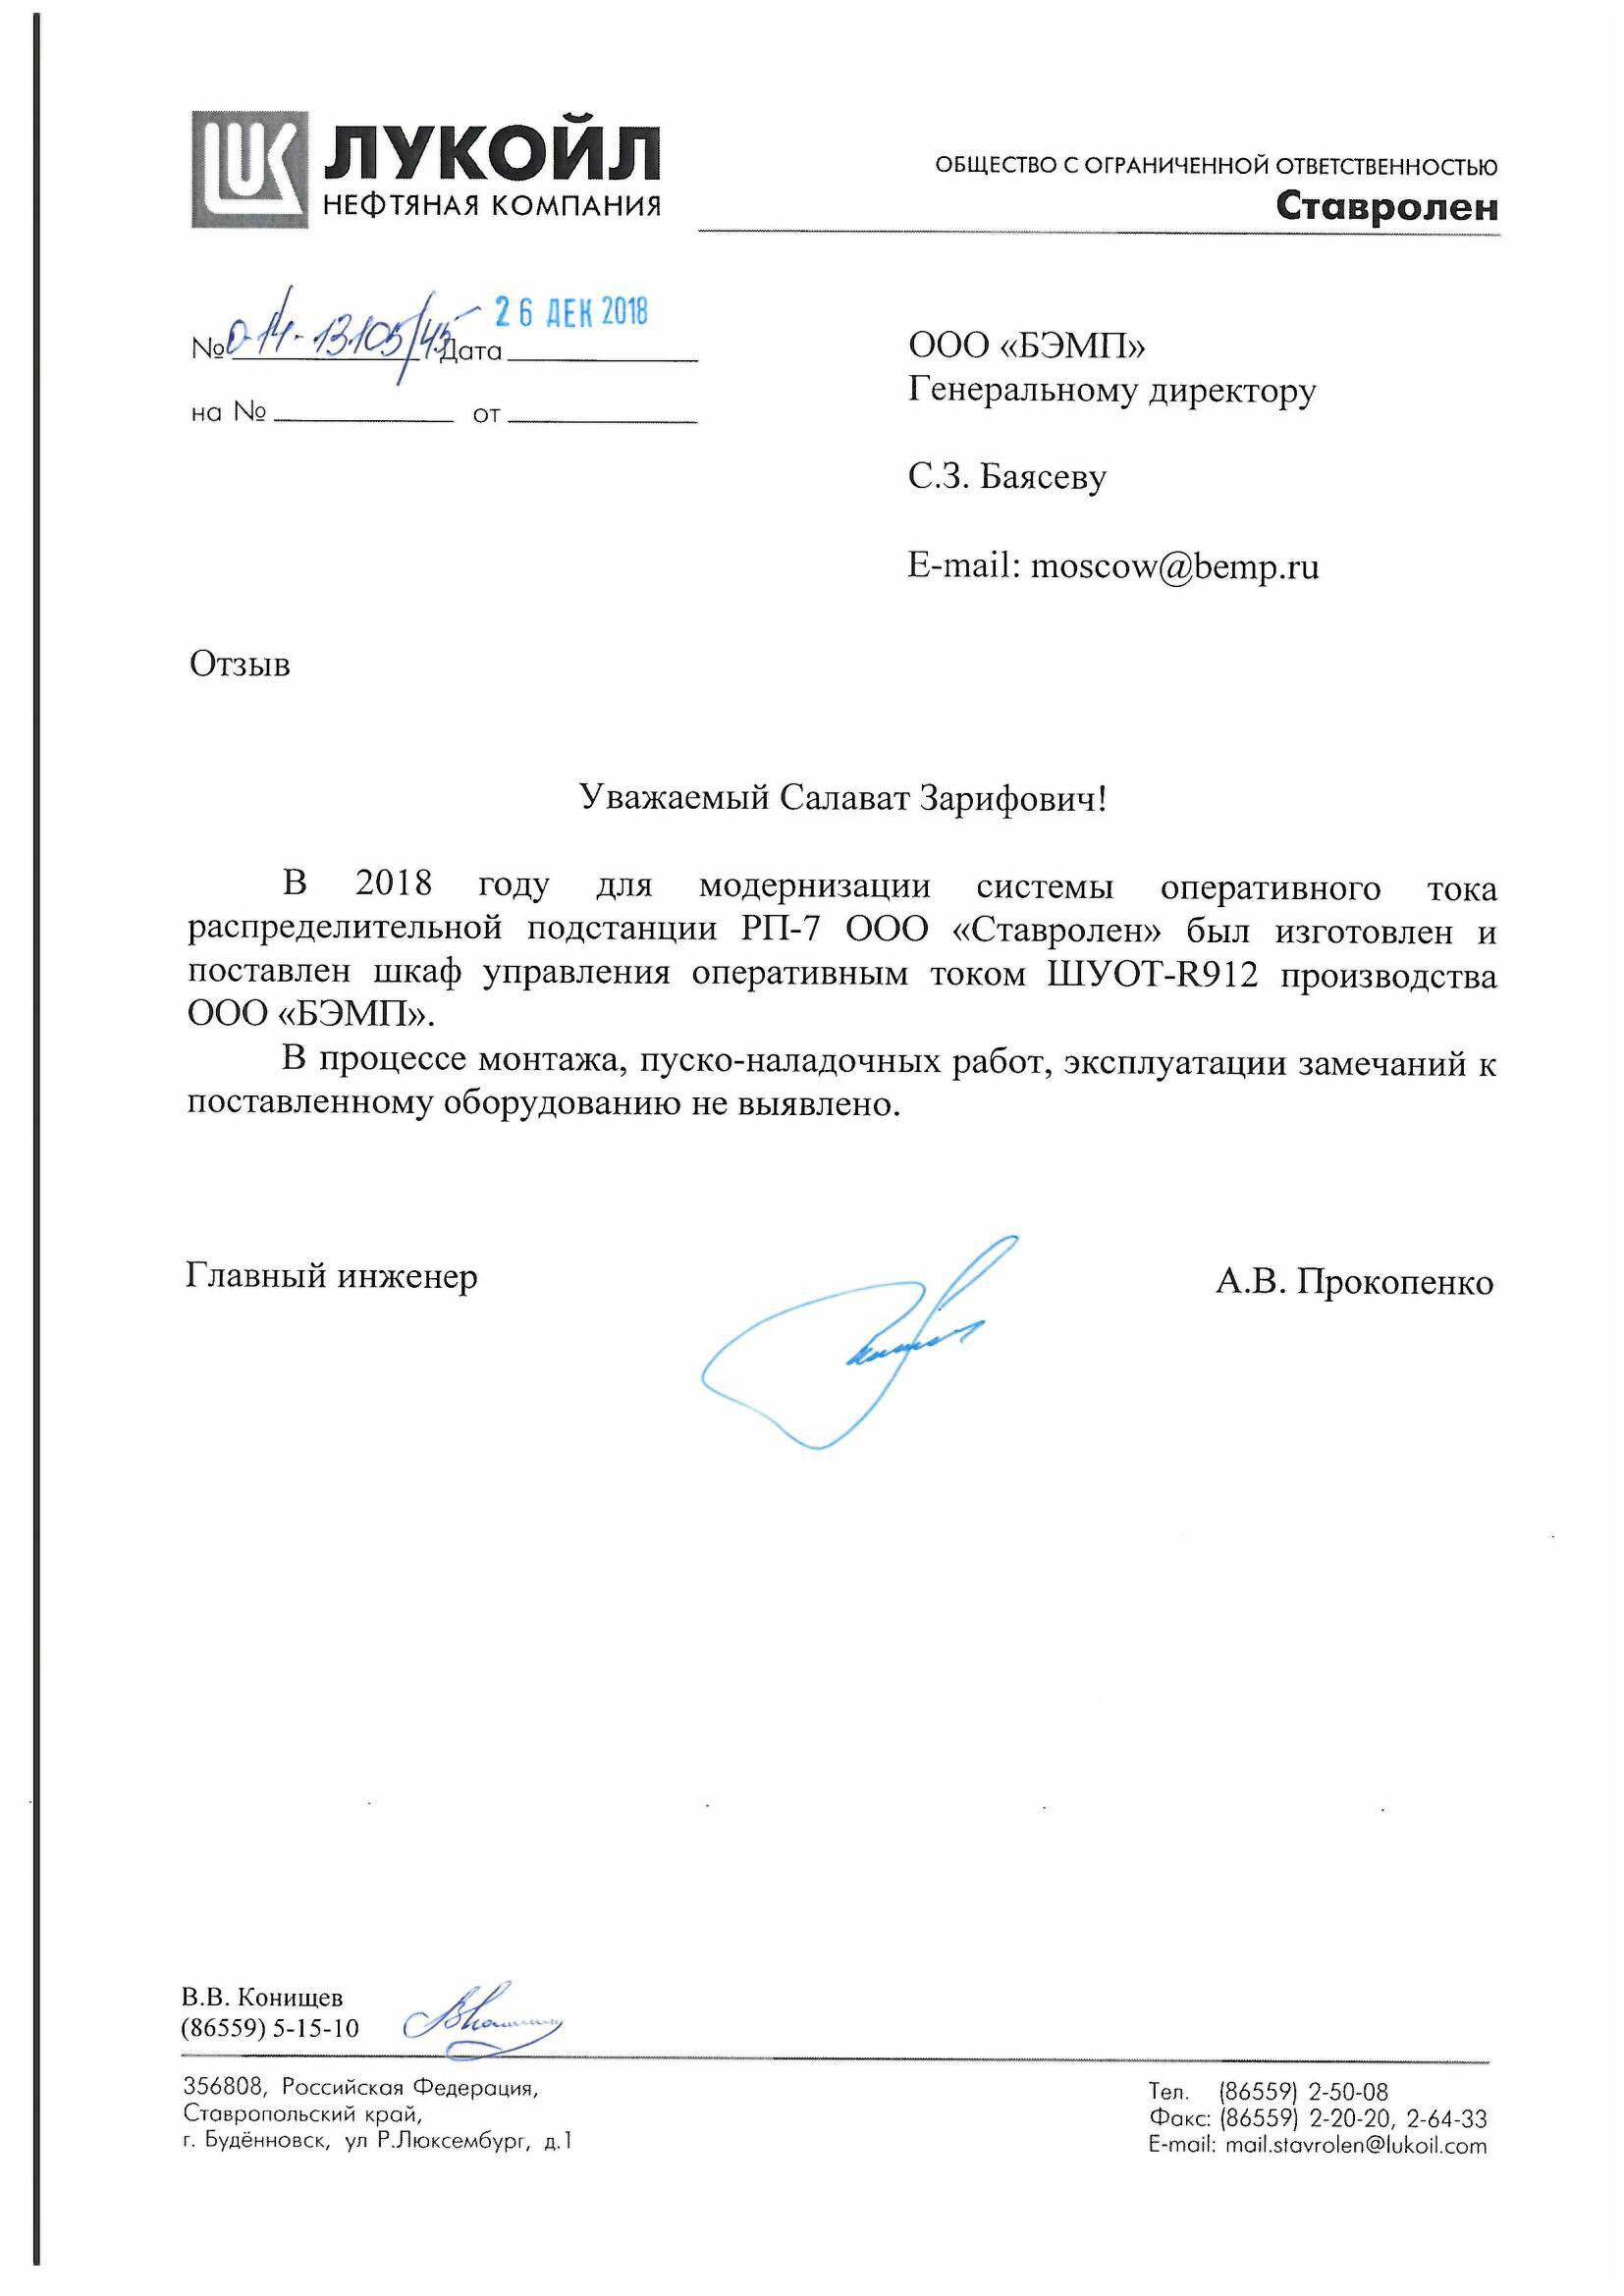 Starolen lukoil ООО «Ставролен» (г. Будённовск)